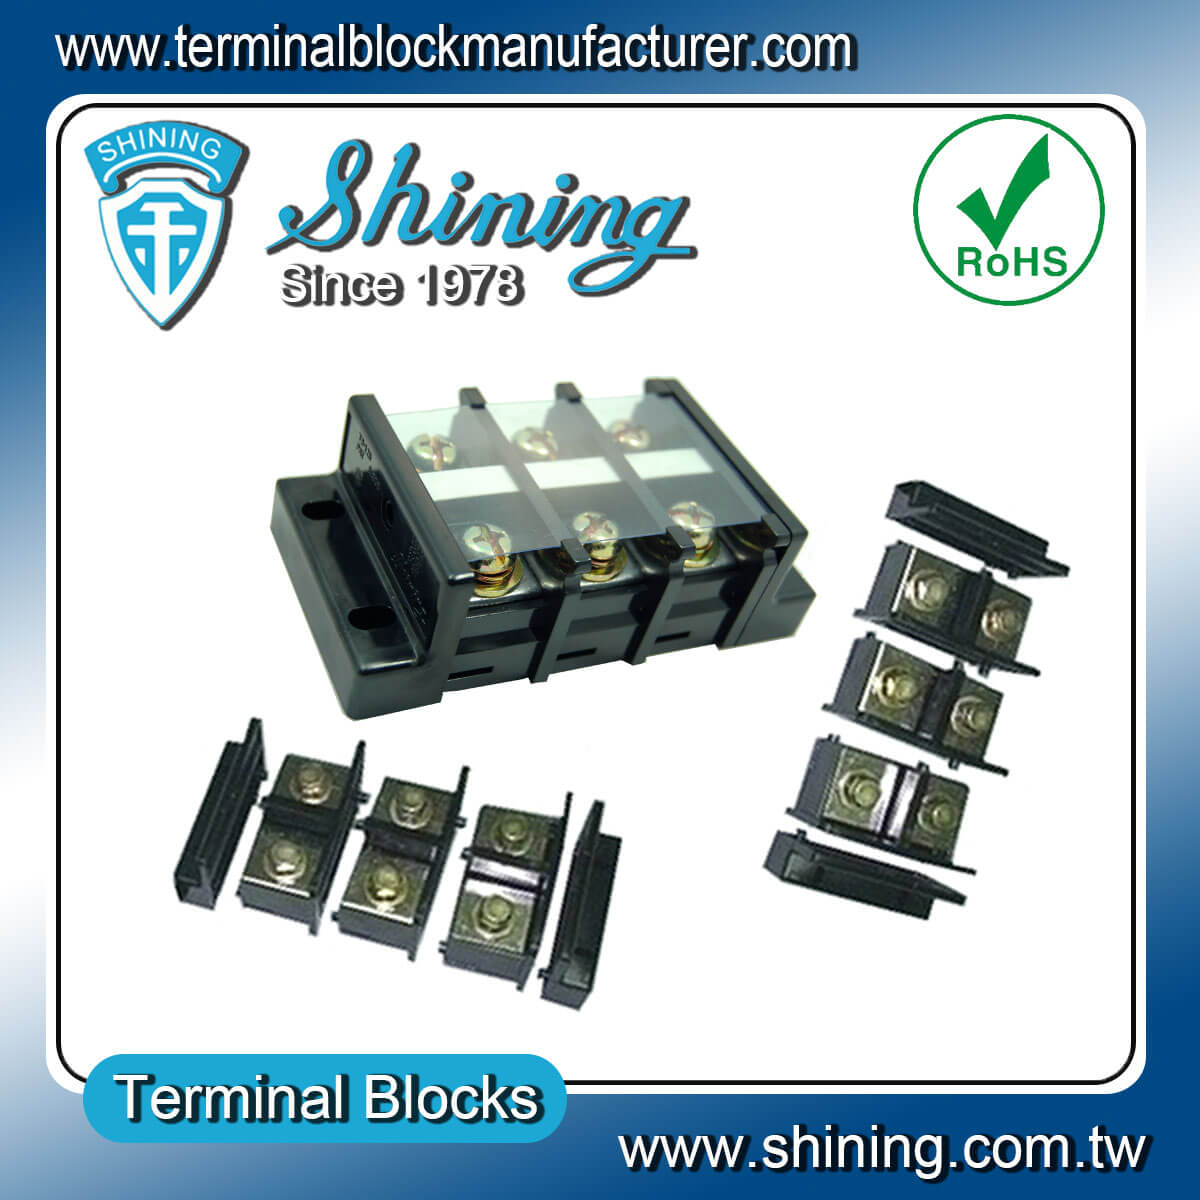 TB-125 600V 125A 組合式柵欄端子台